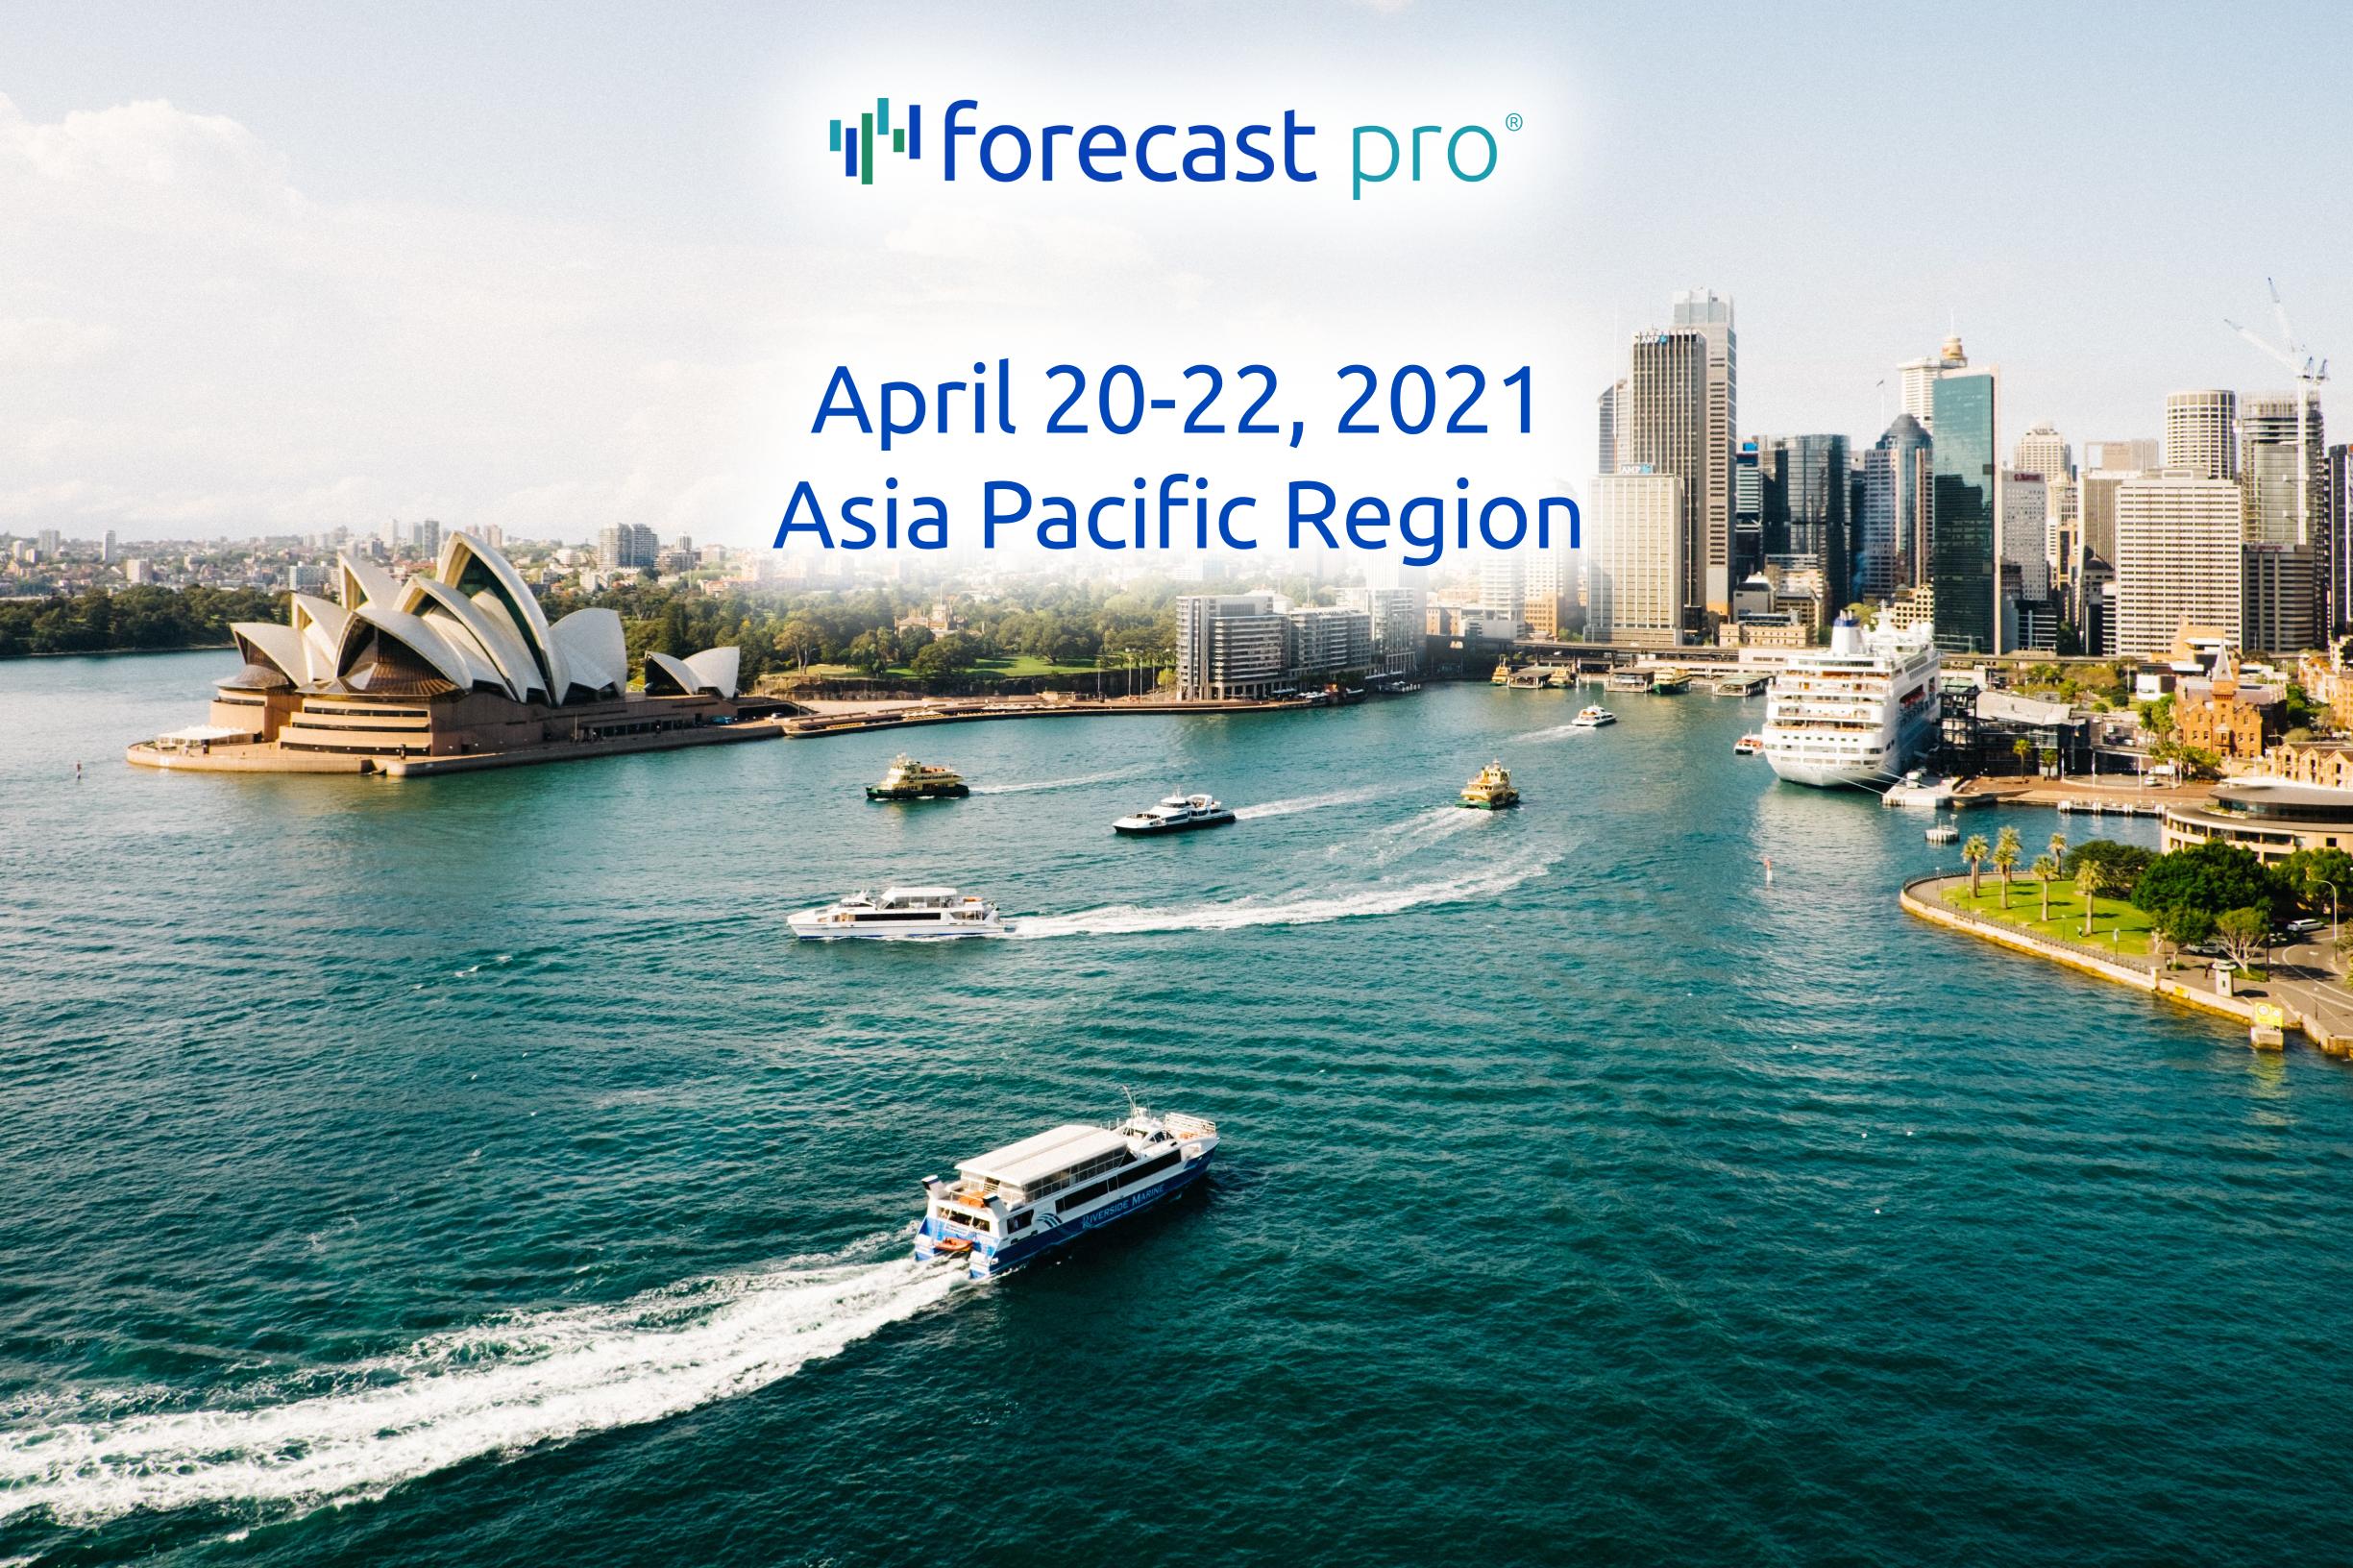 Live Online Workshop: Business Forecasting Techniques, Best Practices & Application Using Forecast Pro